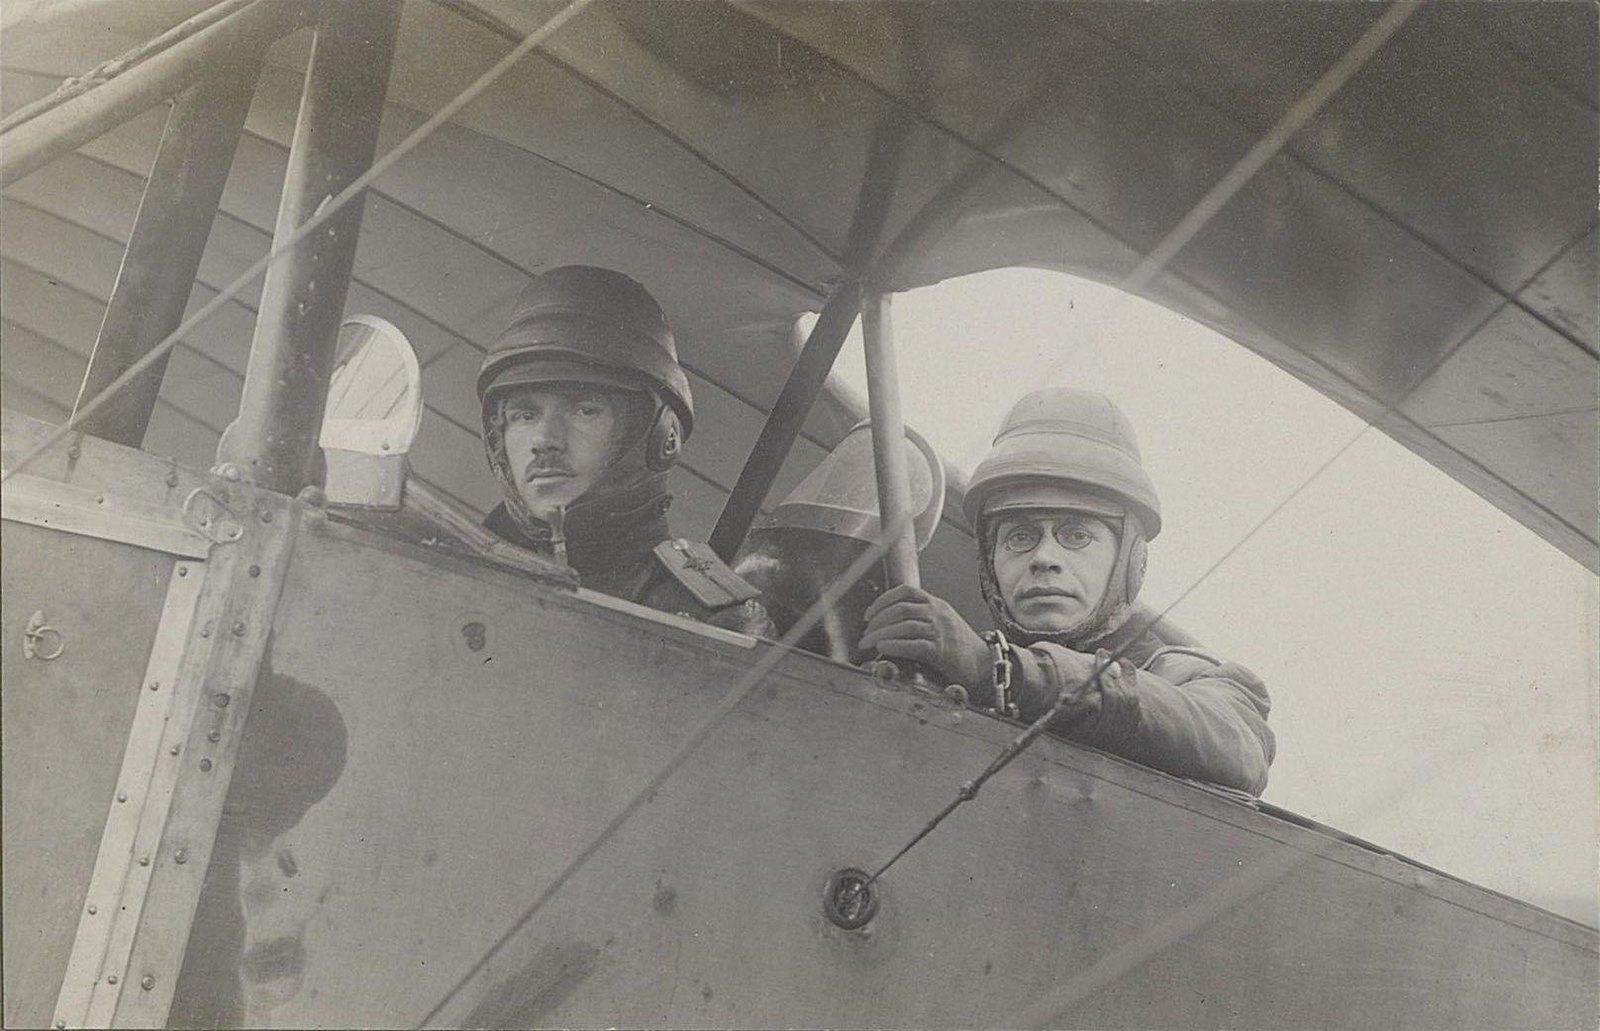 1915. Два лётчика в шлемах